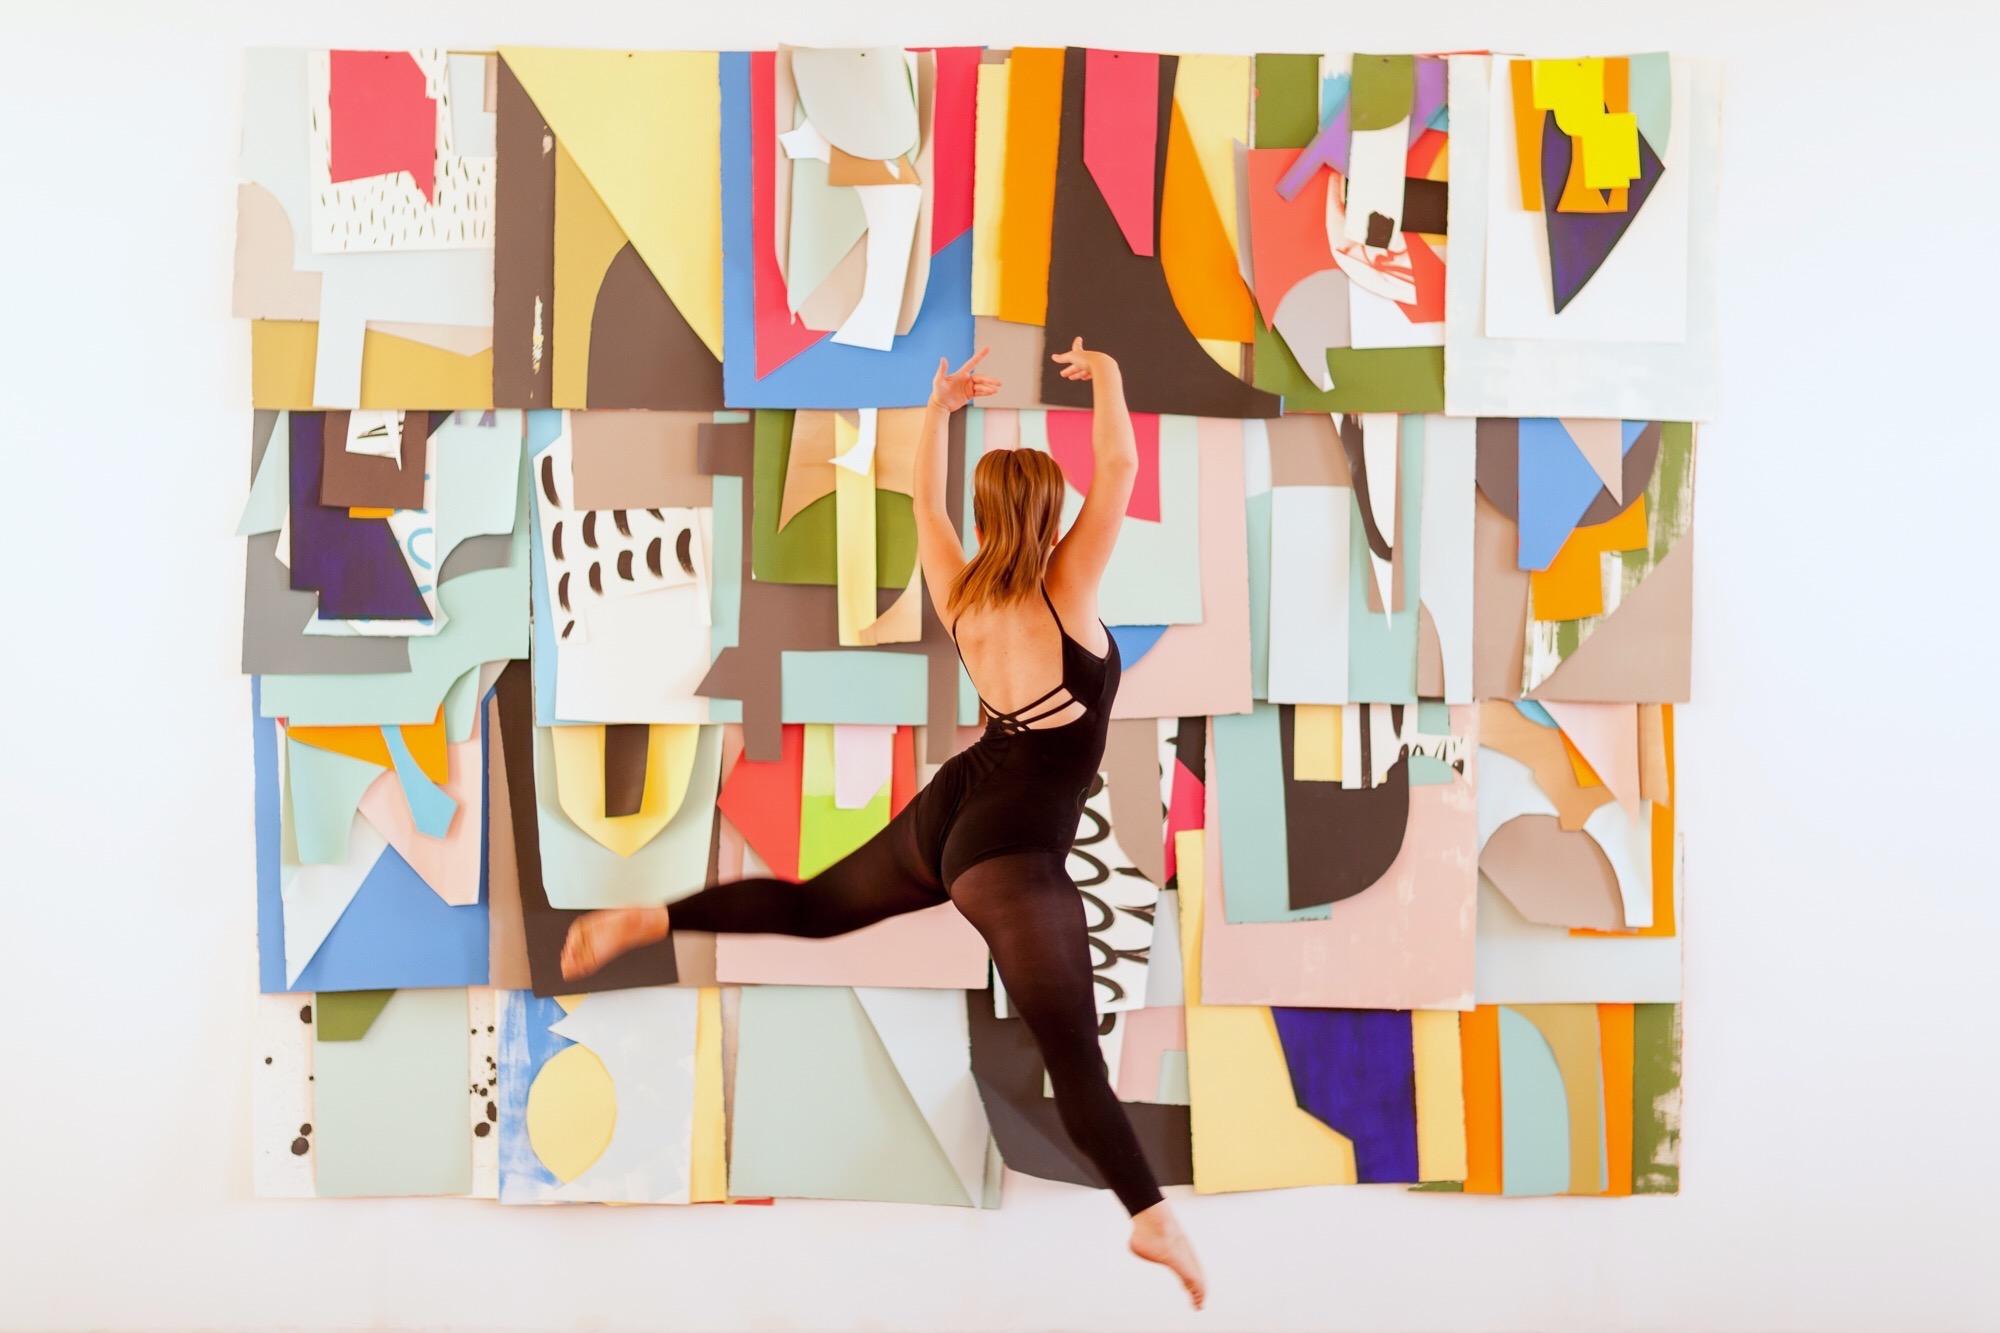 Integration, interpretive performance in a lyrical ballet style